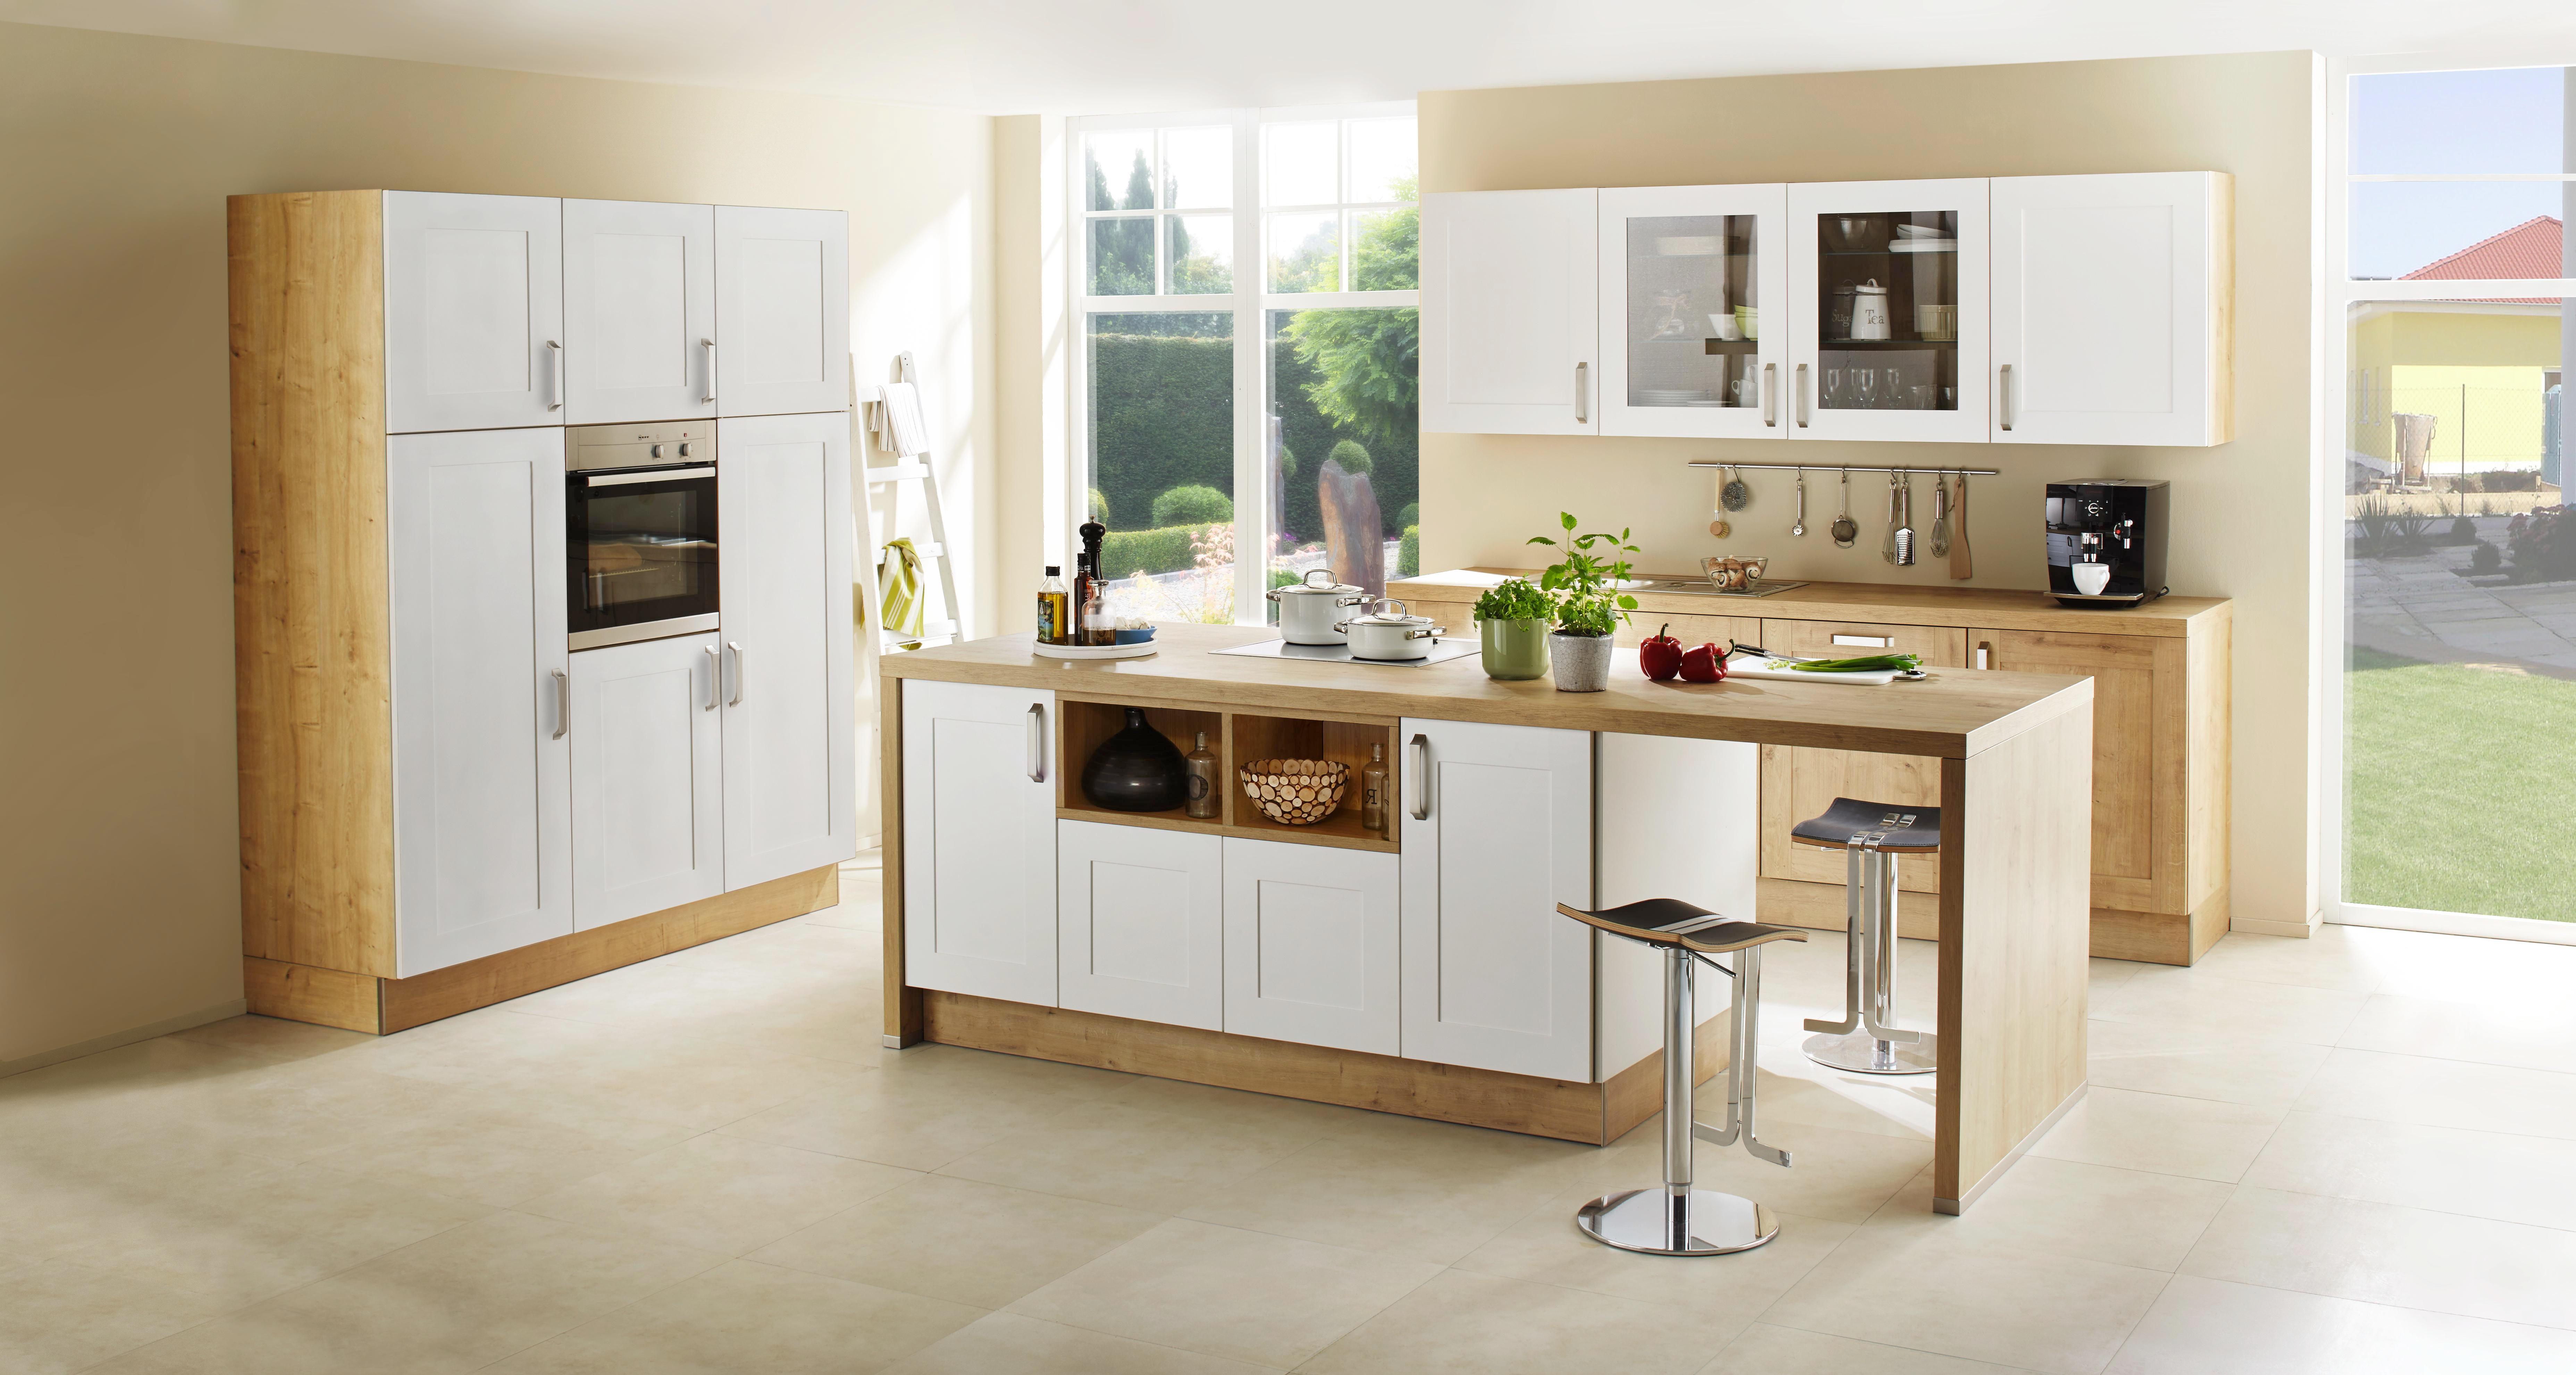 Nolte Küchen online bestellen kuechenforyoude 5211837 - sixpacknow.info